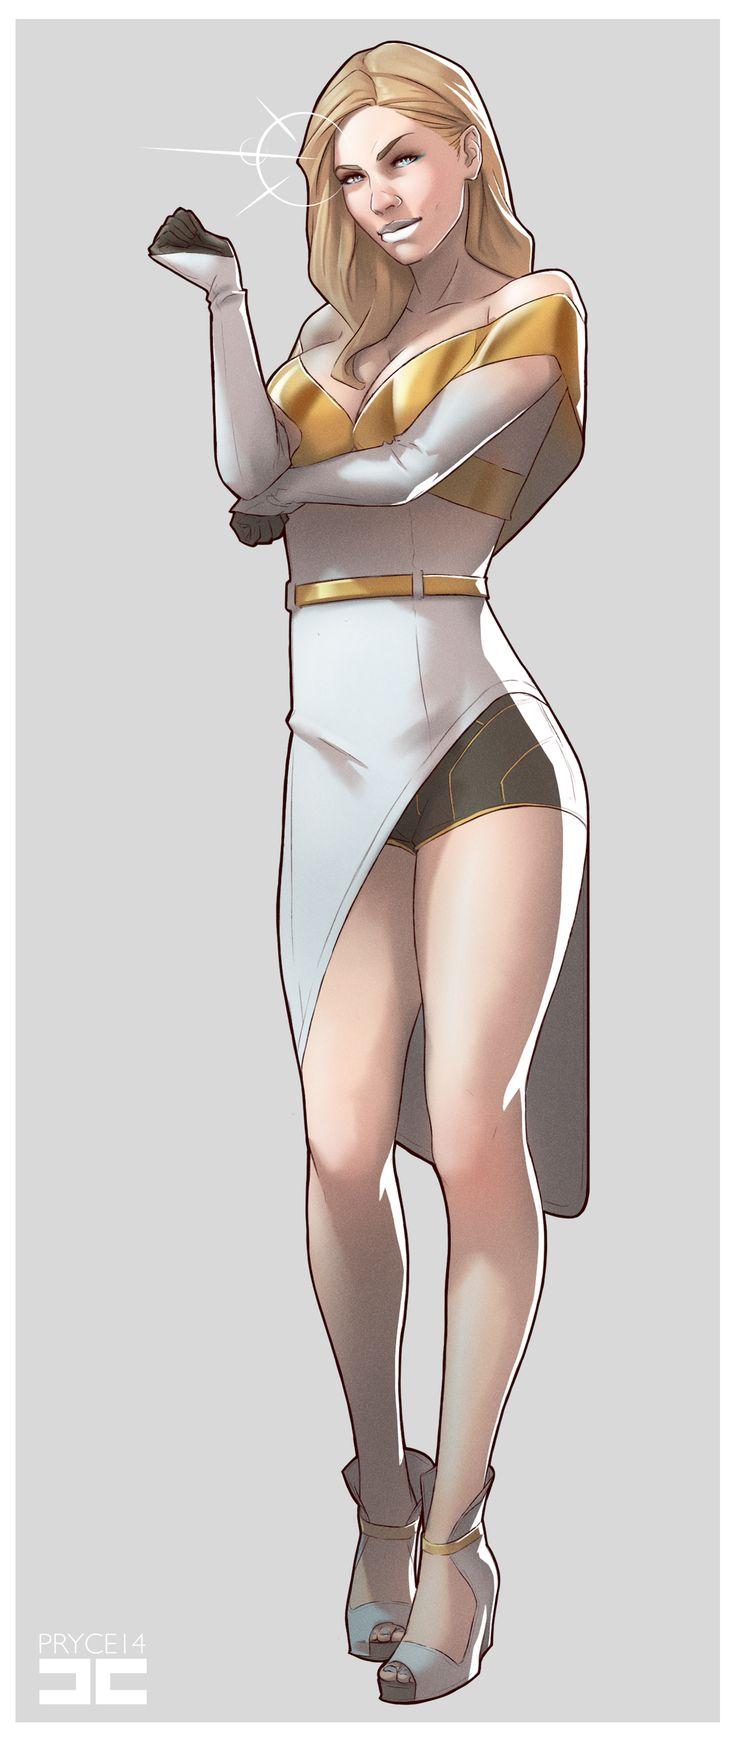 EMMA FROST by Pryce14.deviantart.com on @deviantART